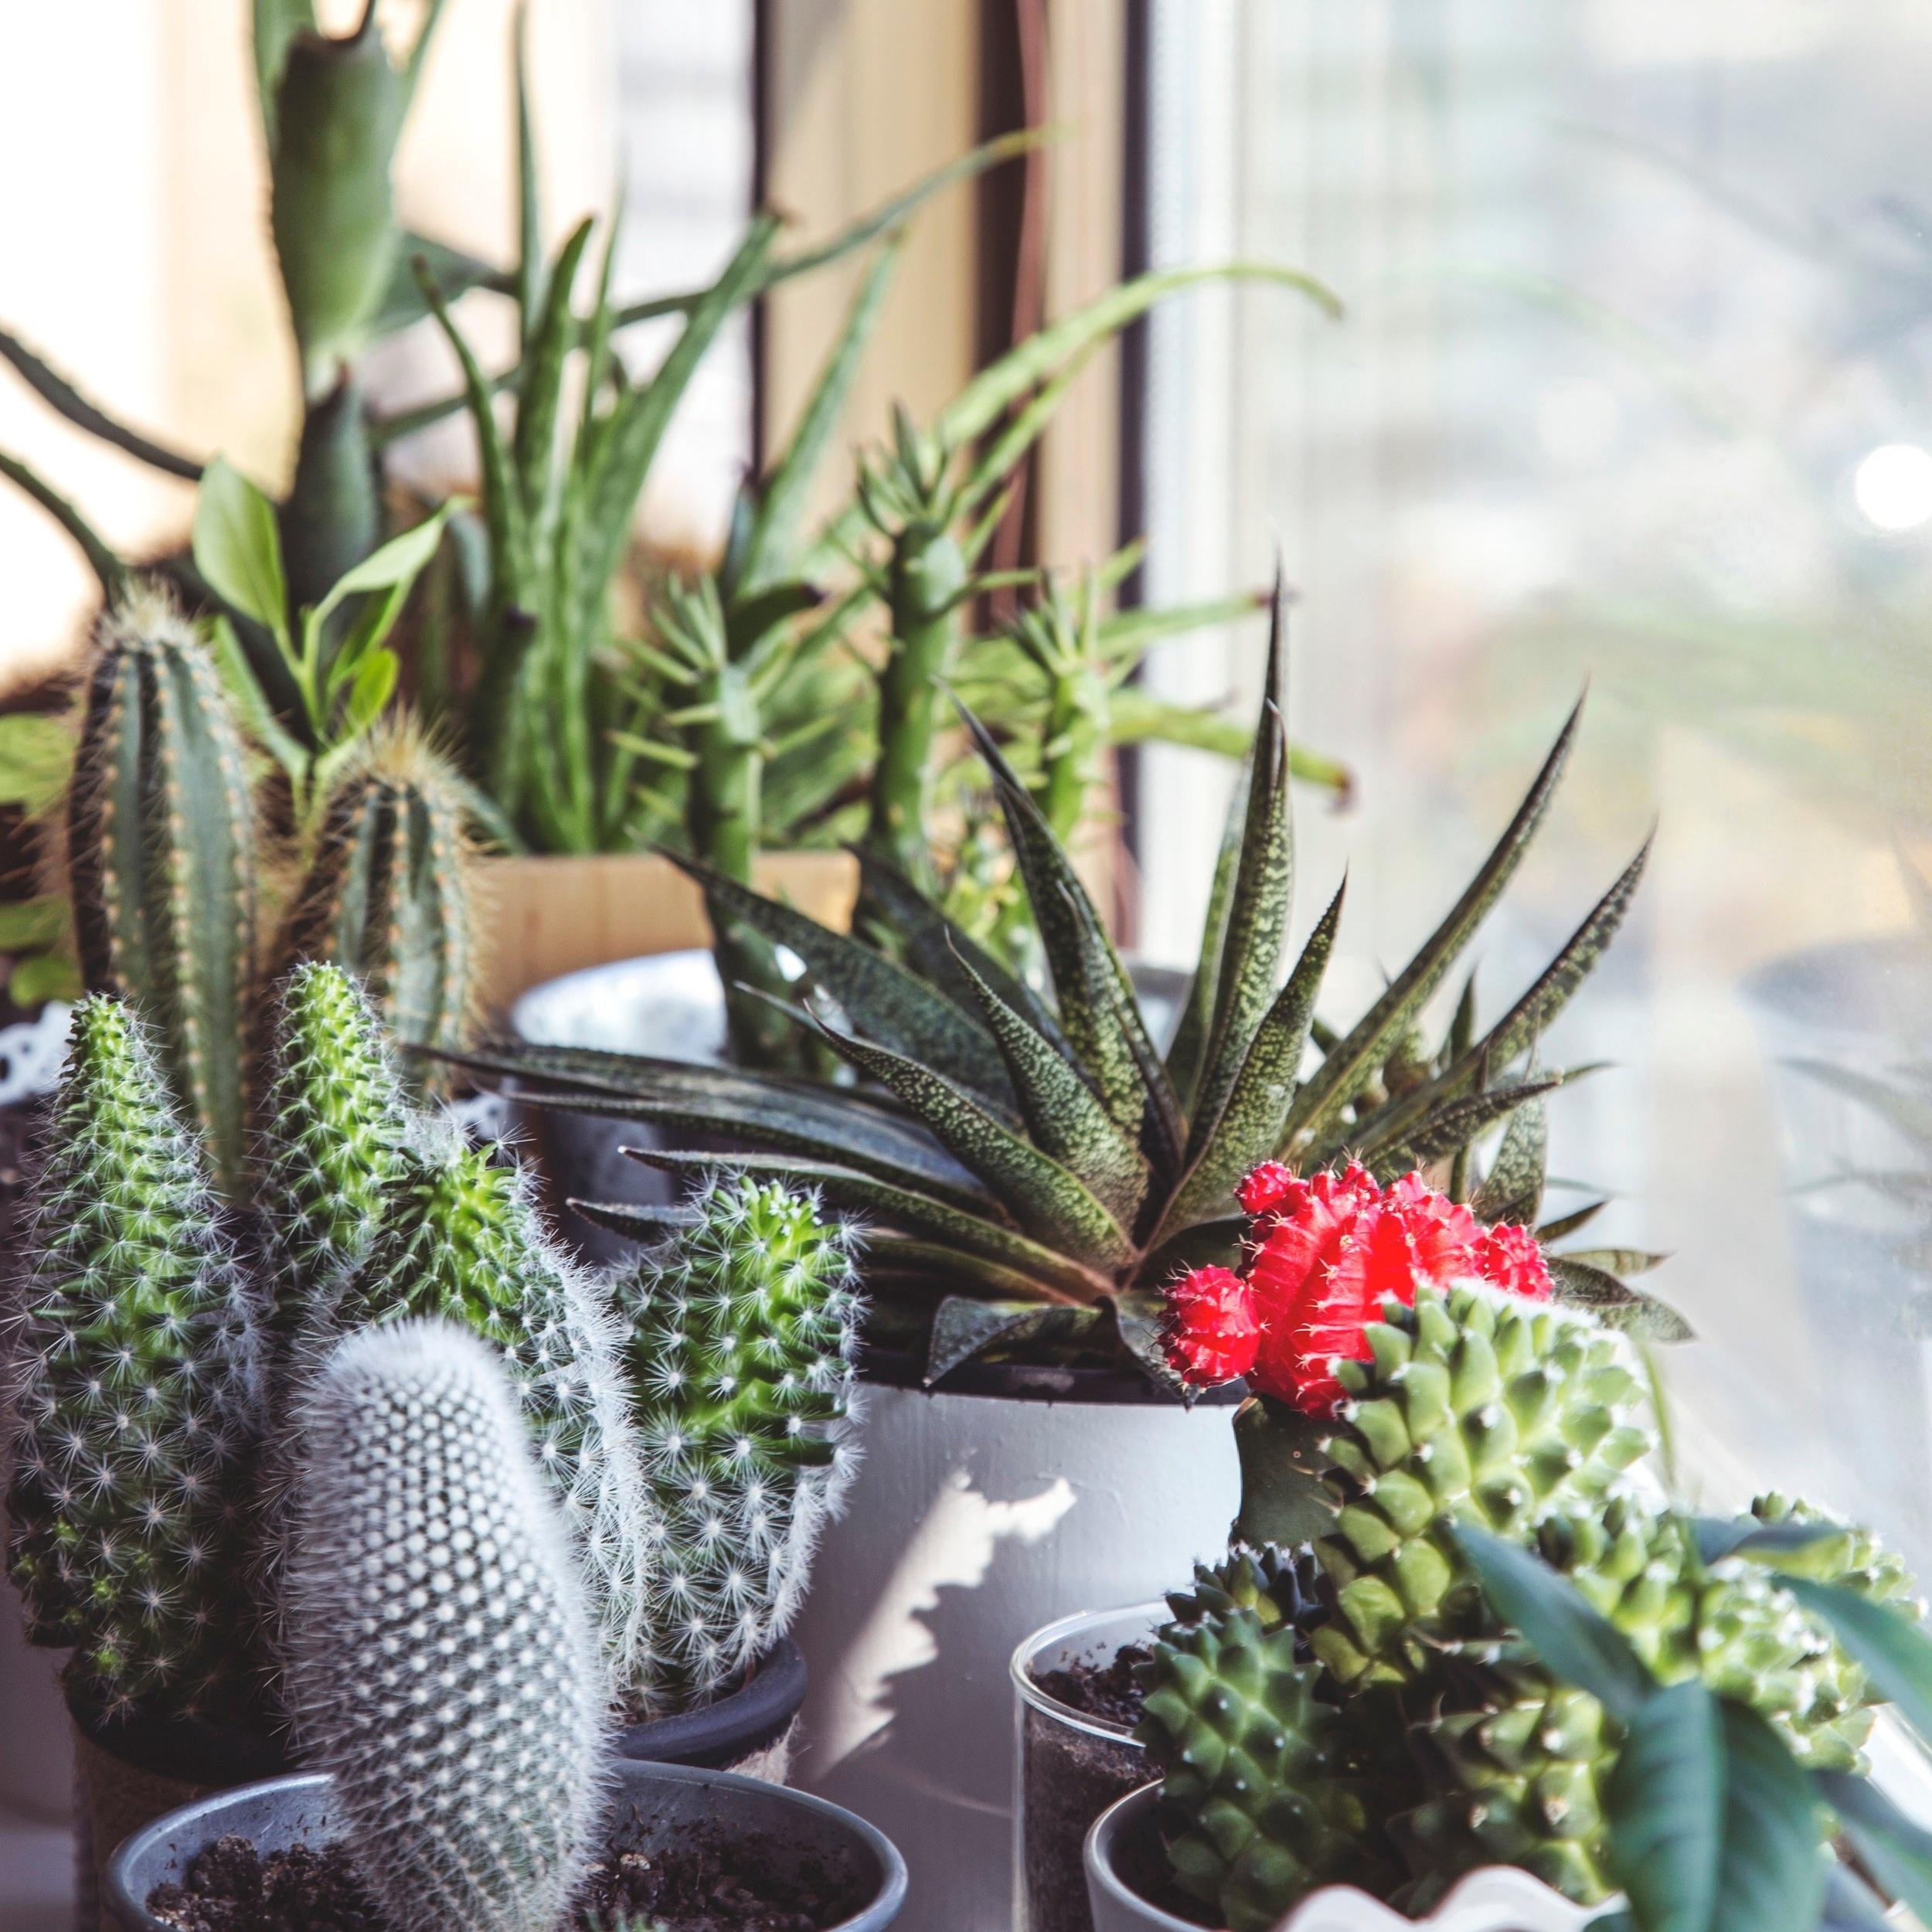 cactus-plant-flower-window-botany-succulent-23258-pxhere.com.jpg